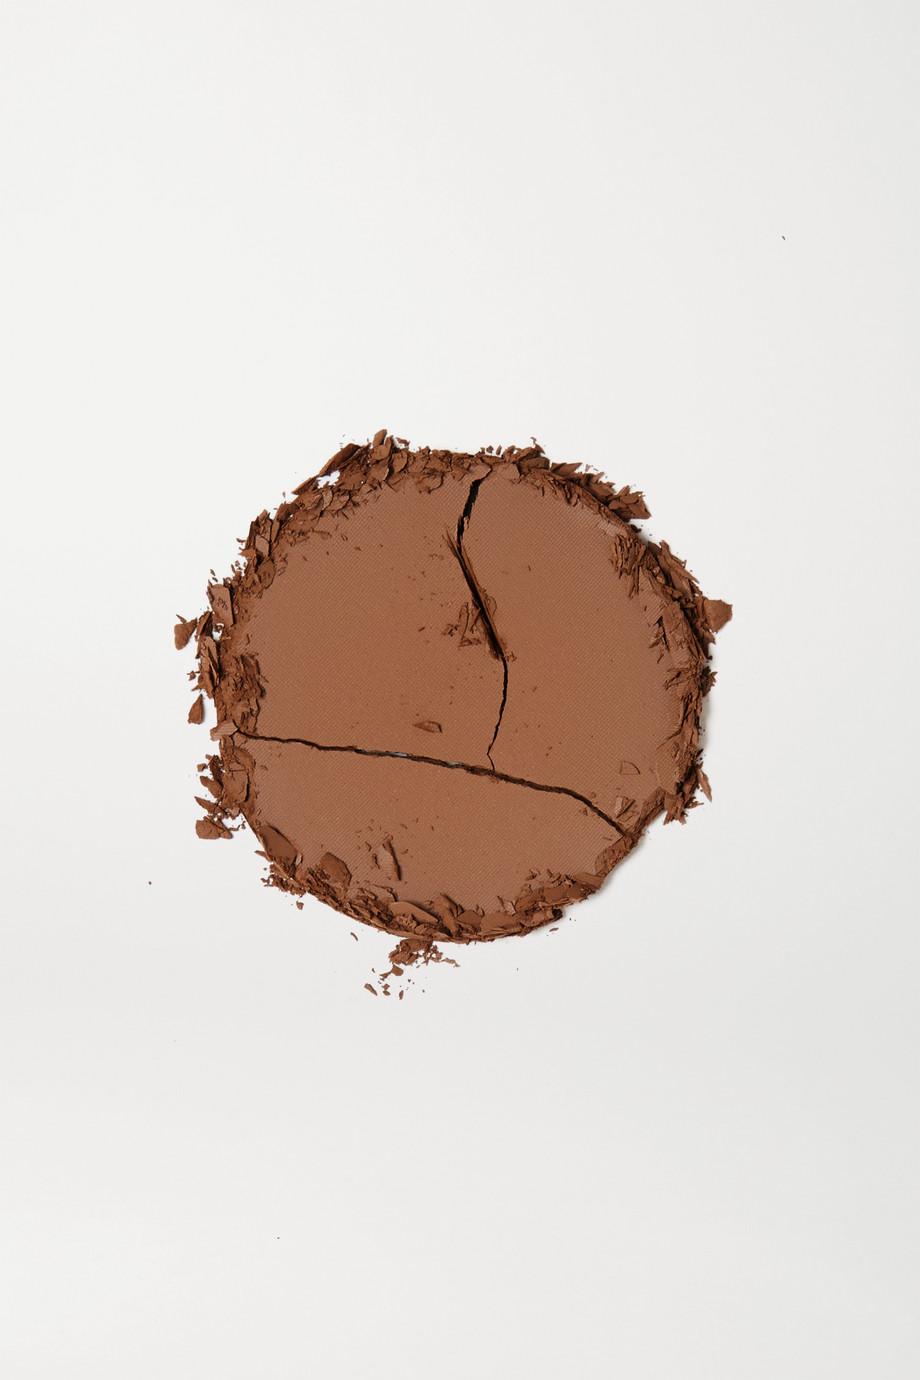 Charlotte Tilbury Airbrush Flawless Finish Micro-Powder - 4 Deep